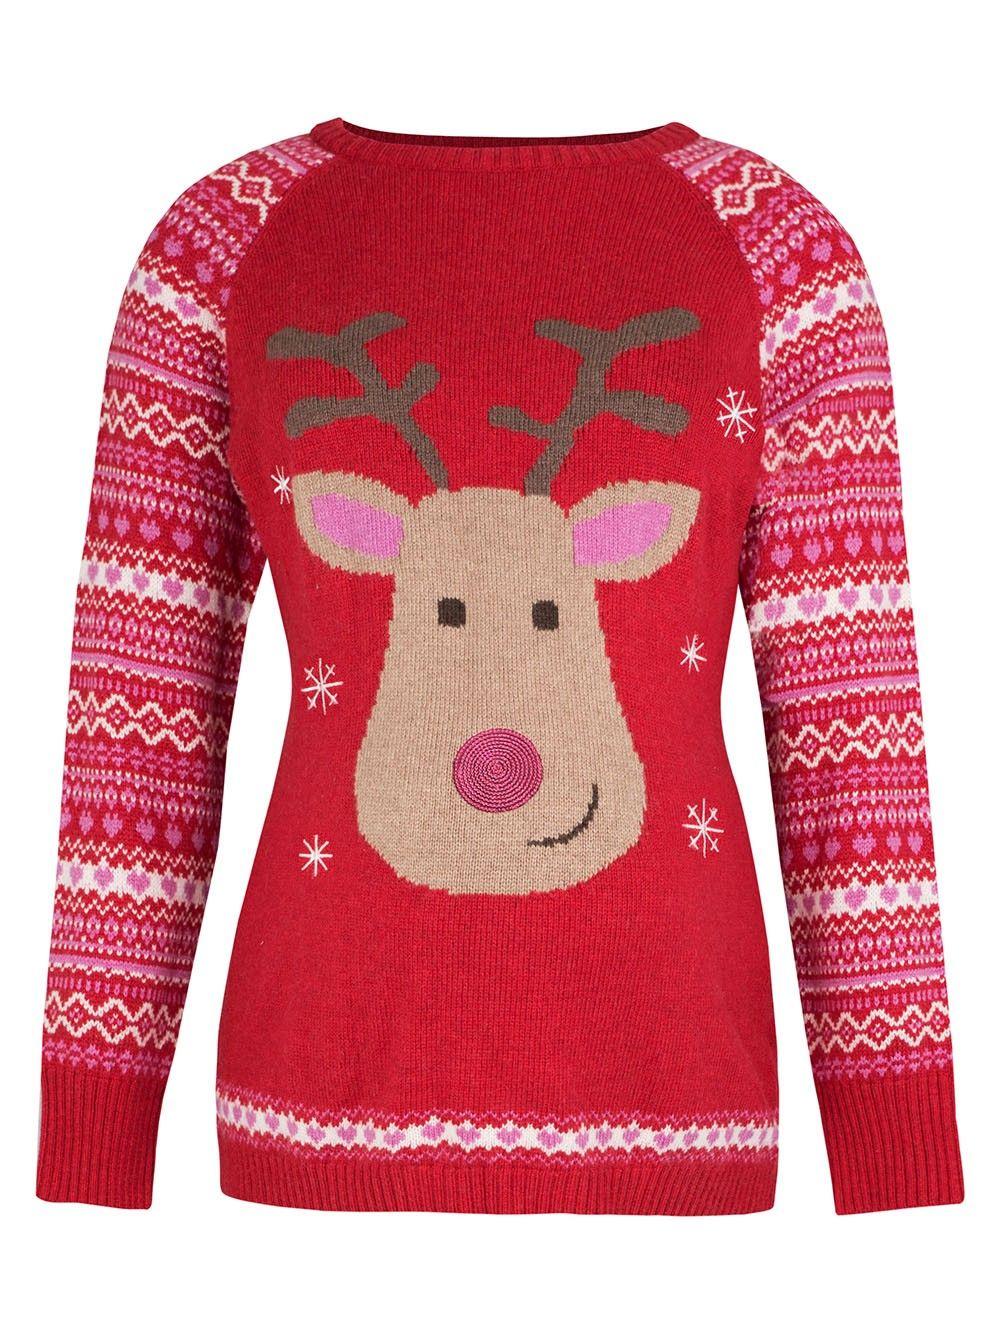 Jojo Christmas Sweater.Red Reindeer Maternity Christmas Jumper Jojo Maman Bebe